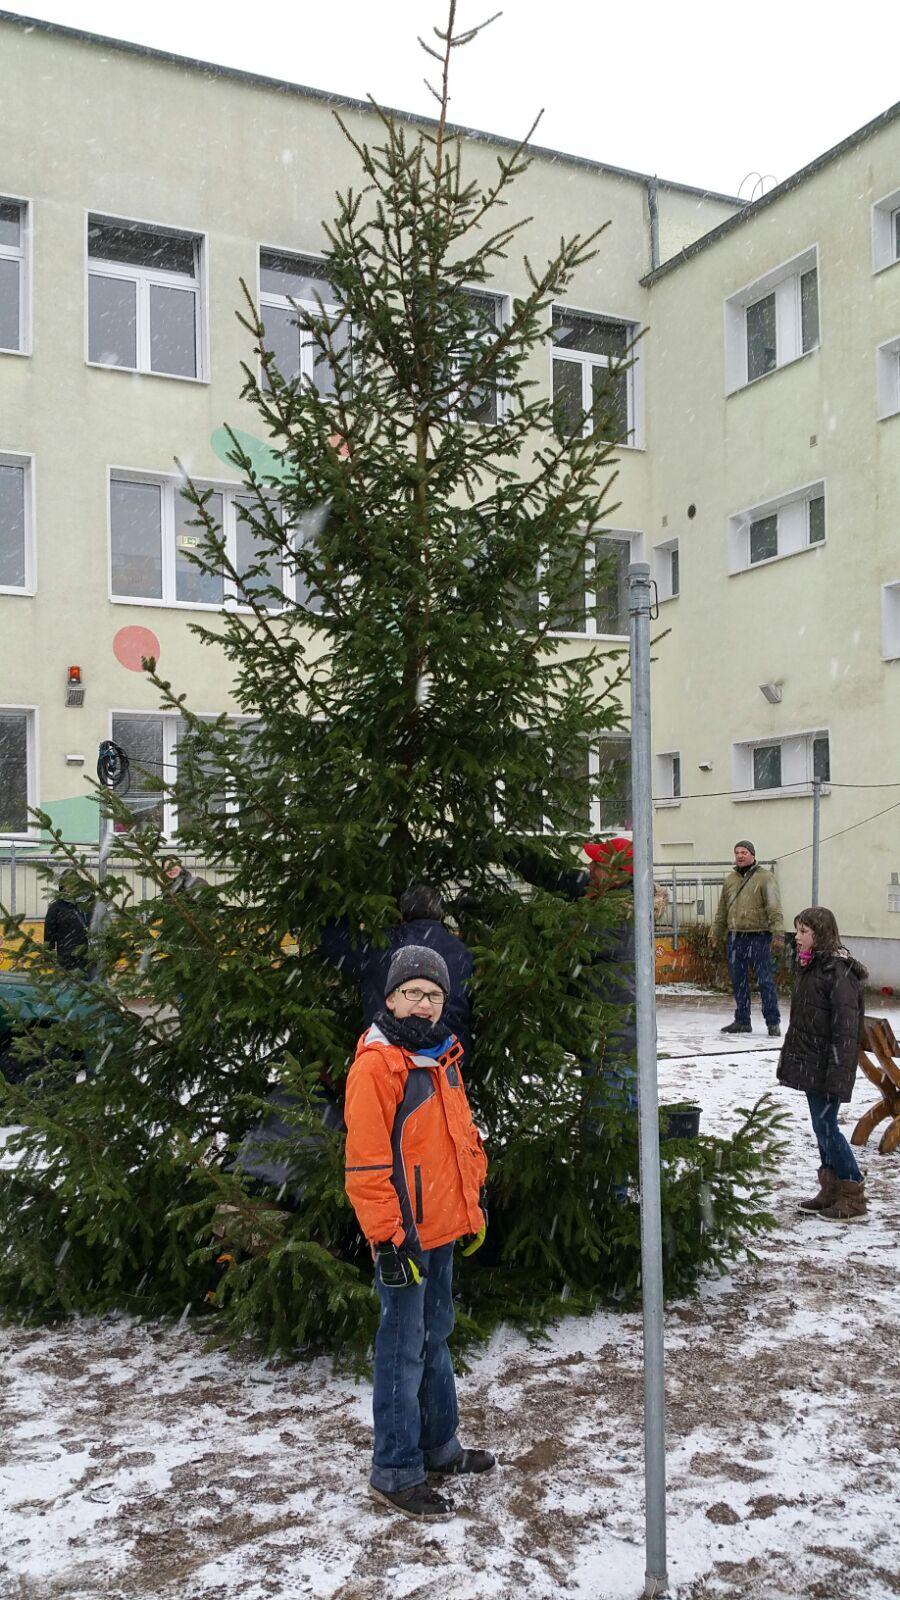 weihnachtsbaum aktion 2015 f rderkreis der mosaik grundschule oberhavel e v mosaikkreis. Black Bedroom Furniture Sets. Home Design Ideas